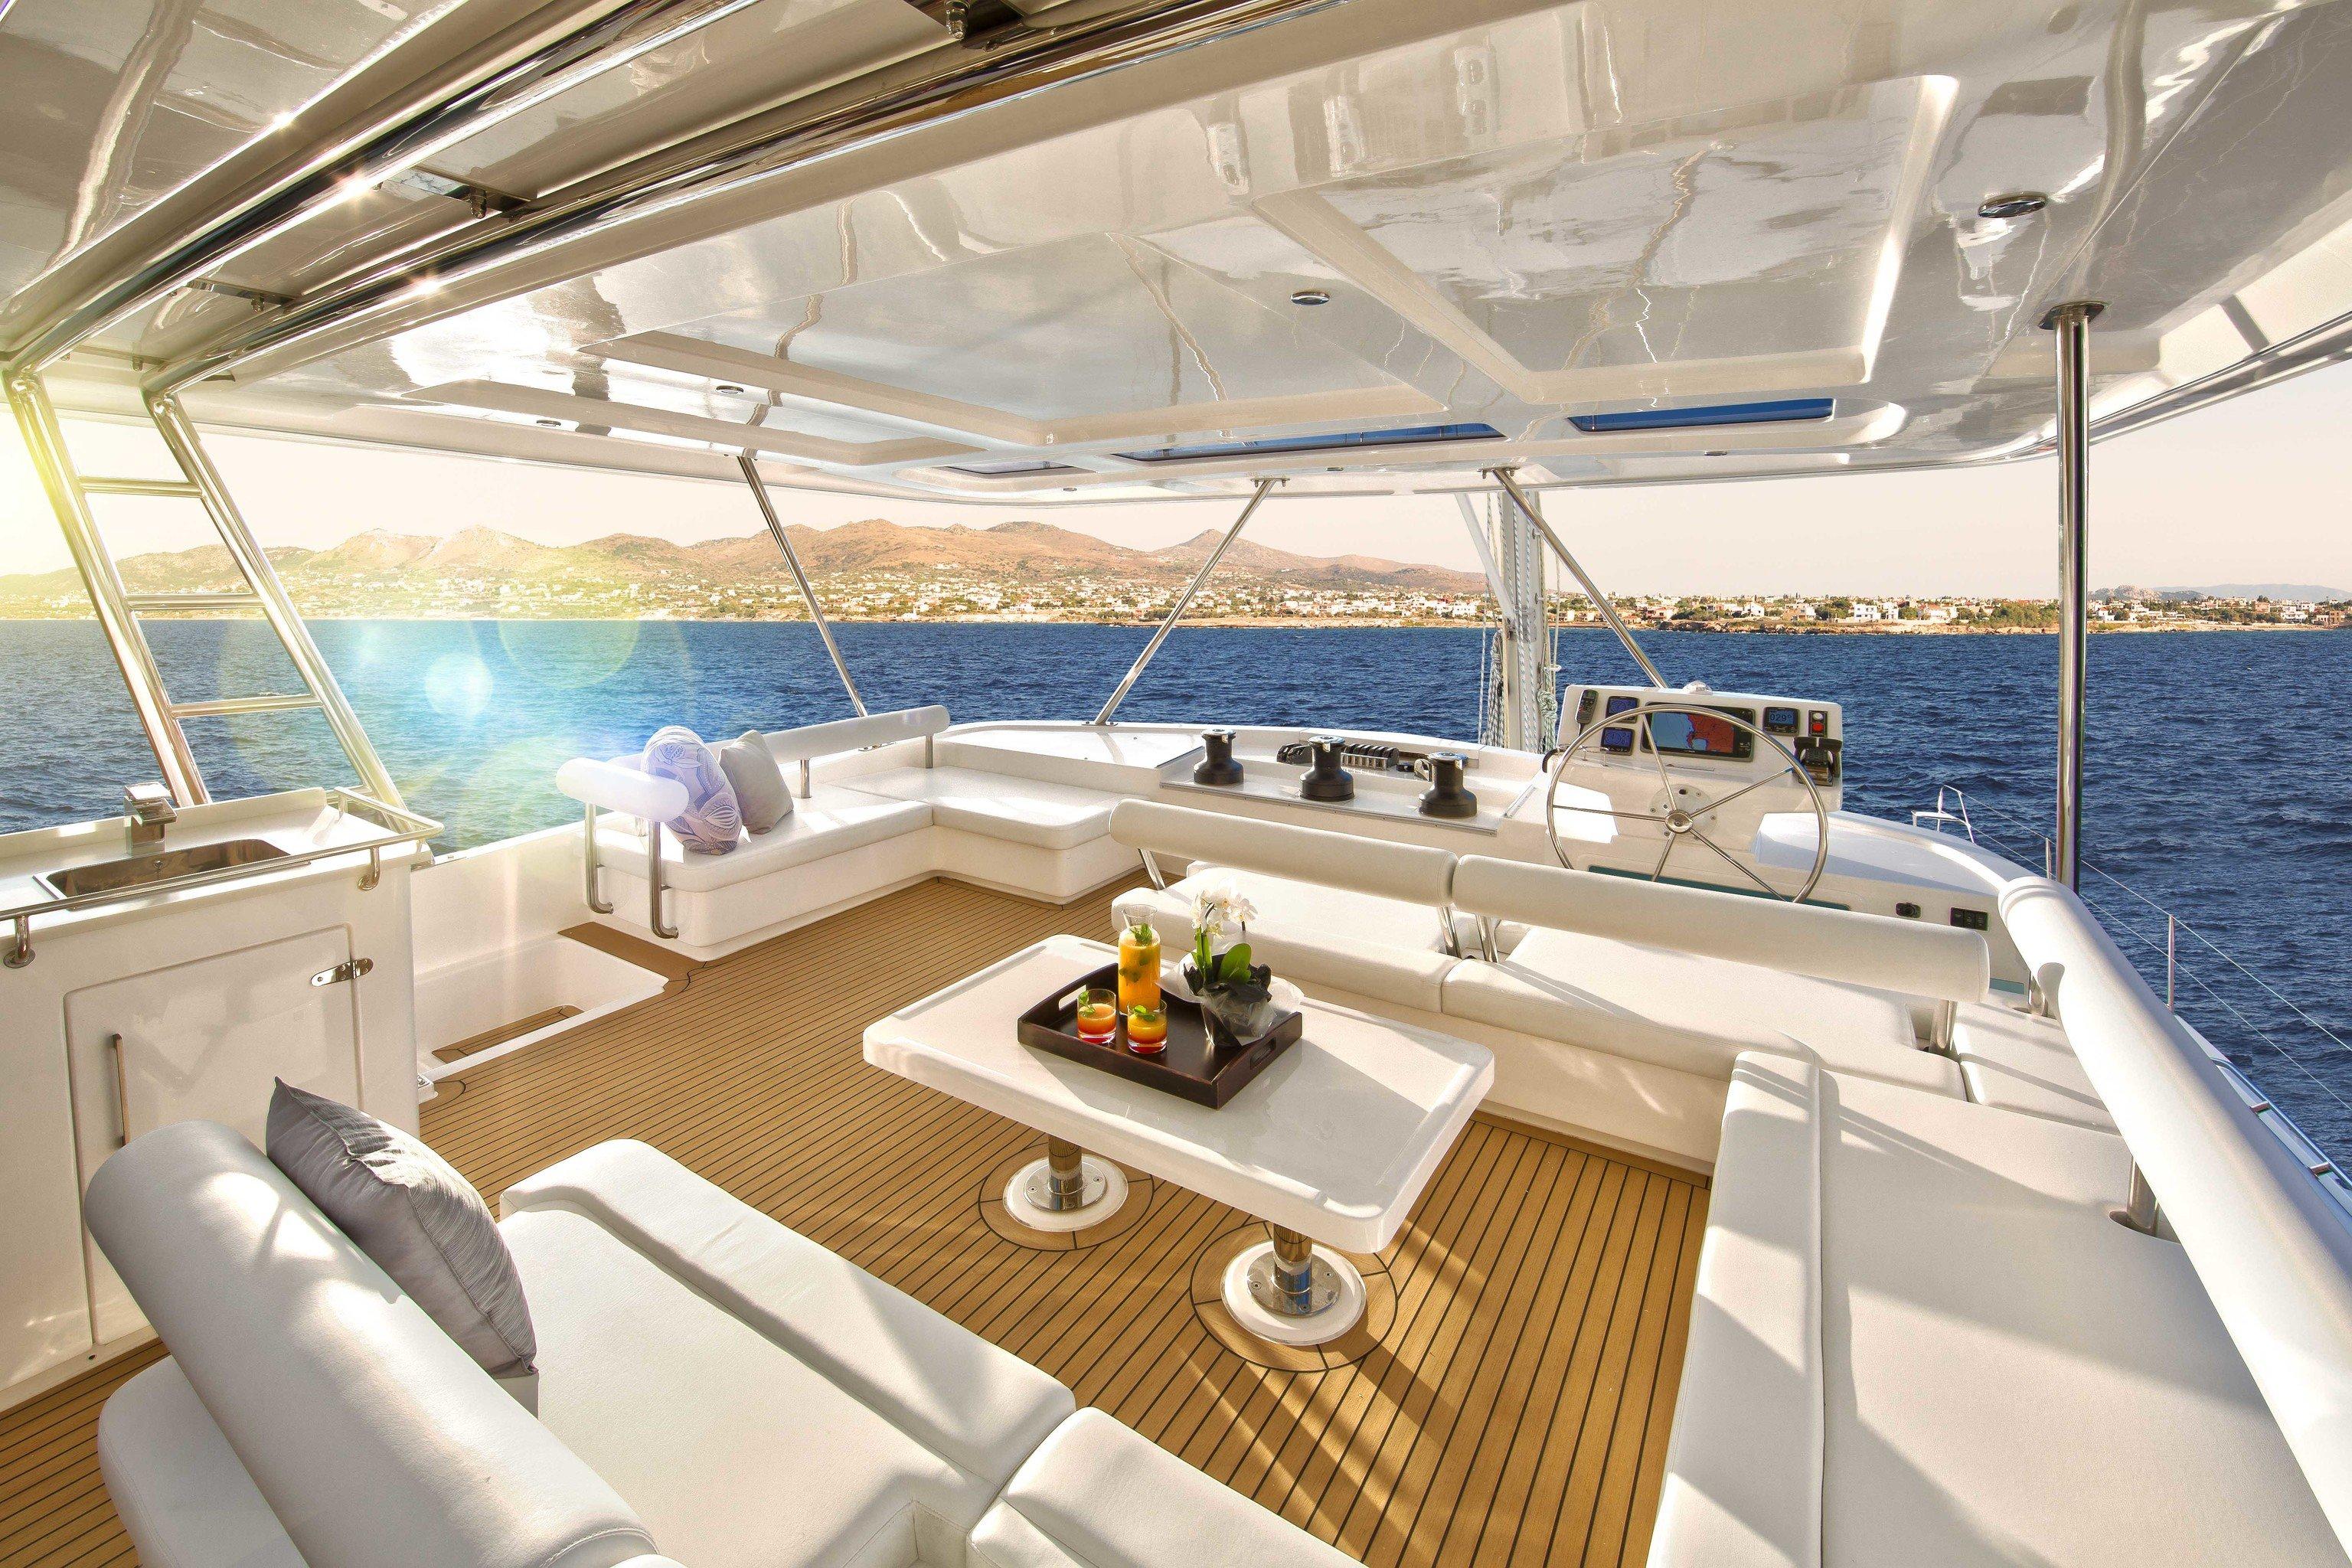 Trip Ideas Boat indoor vehicle watercraft yacht Deck ship luxury yacht